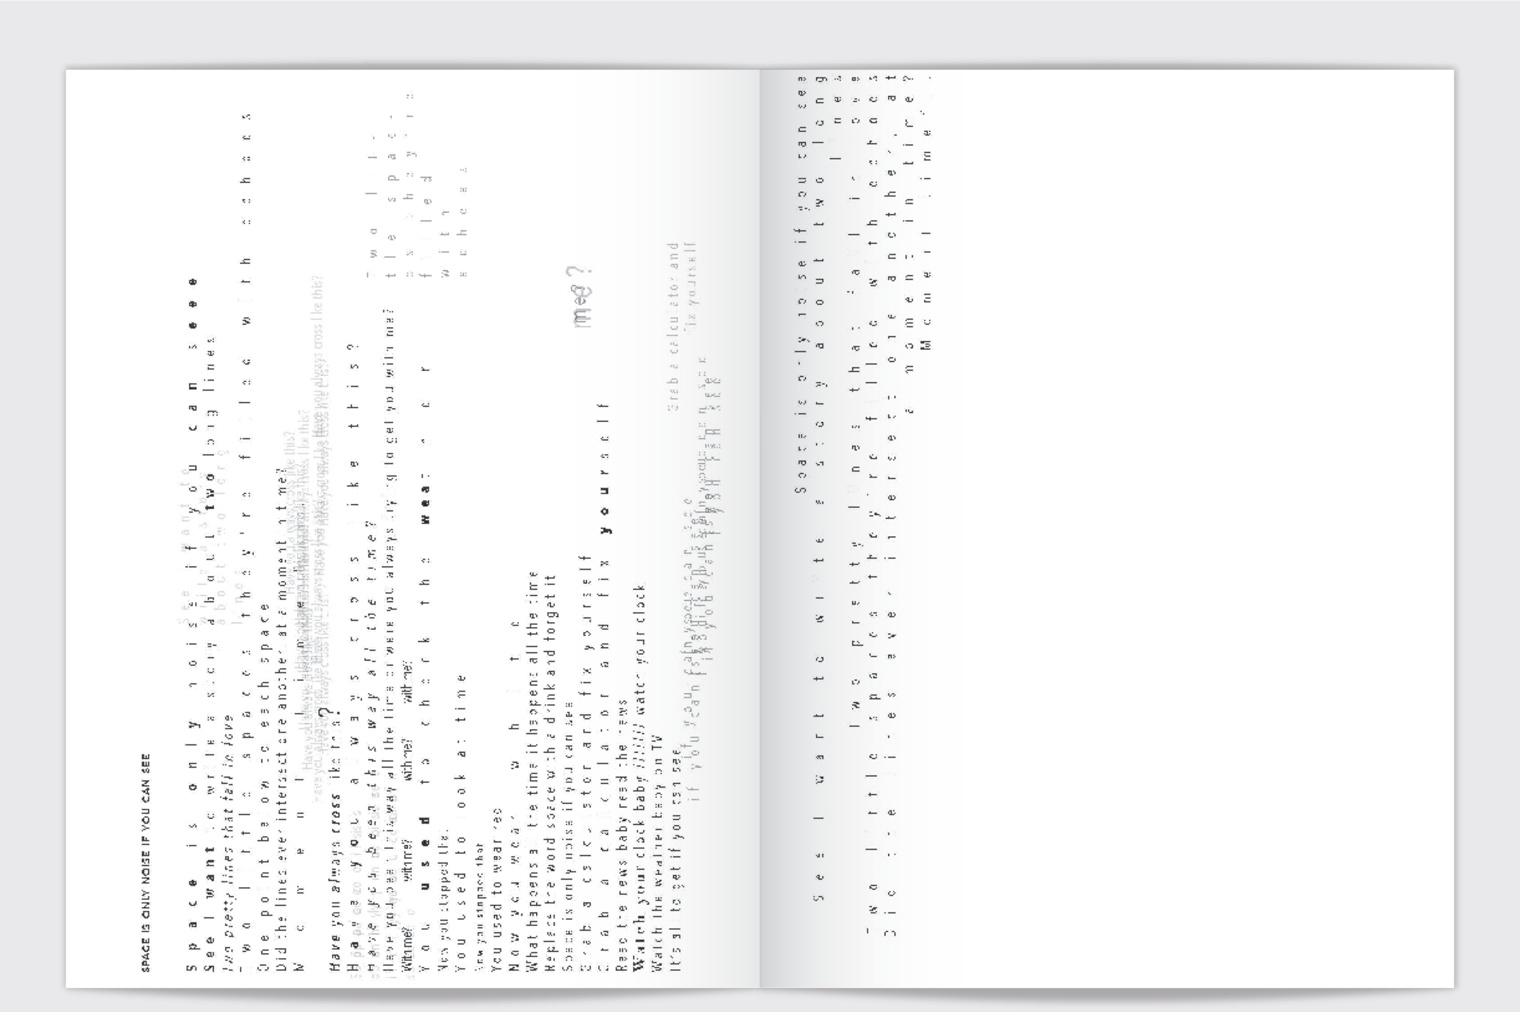 Artboard_1_copy_4-100.jpg